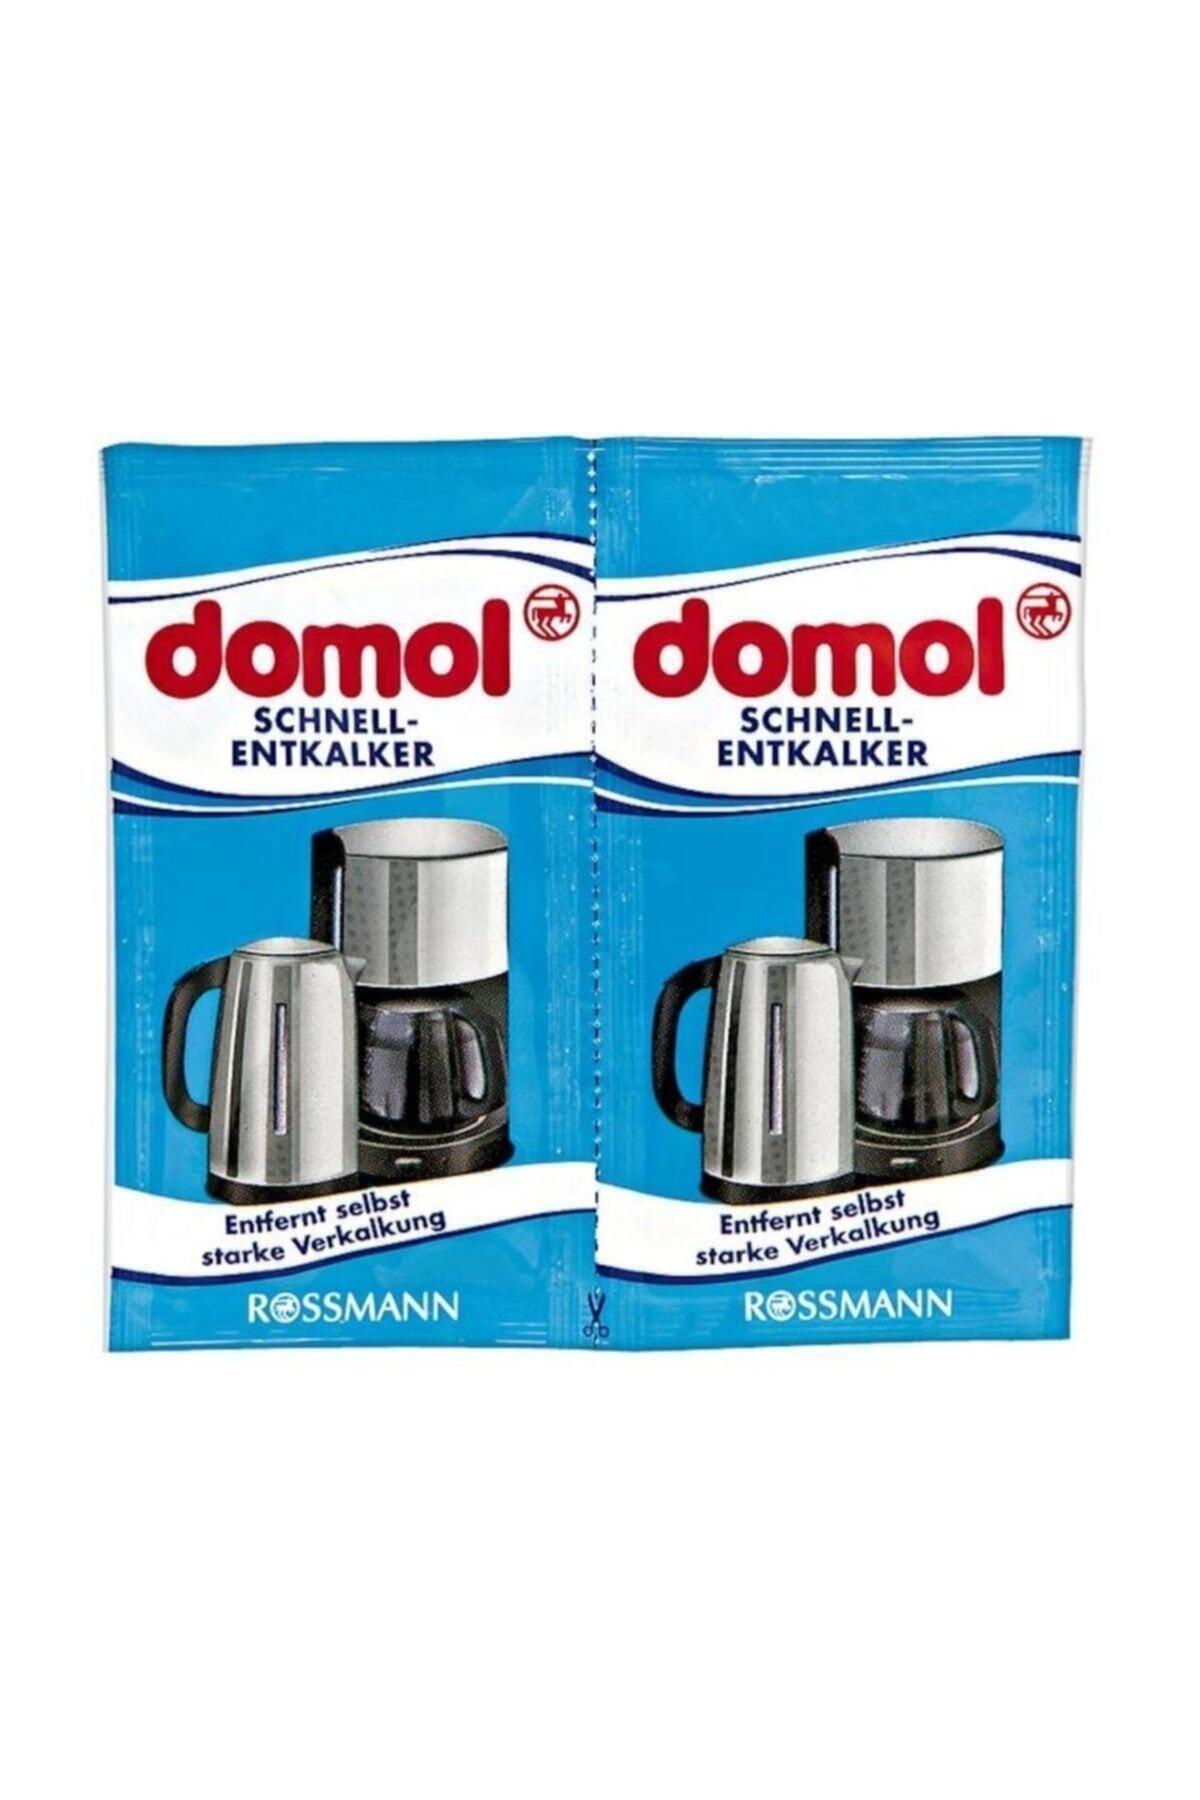 DOMOL Kettle Kahve Makinesi Kireç Çözücü Toz 2'li Paket 1